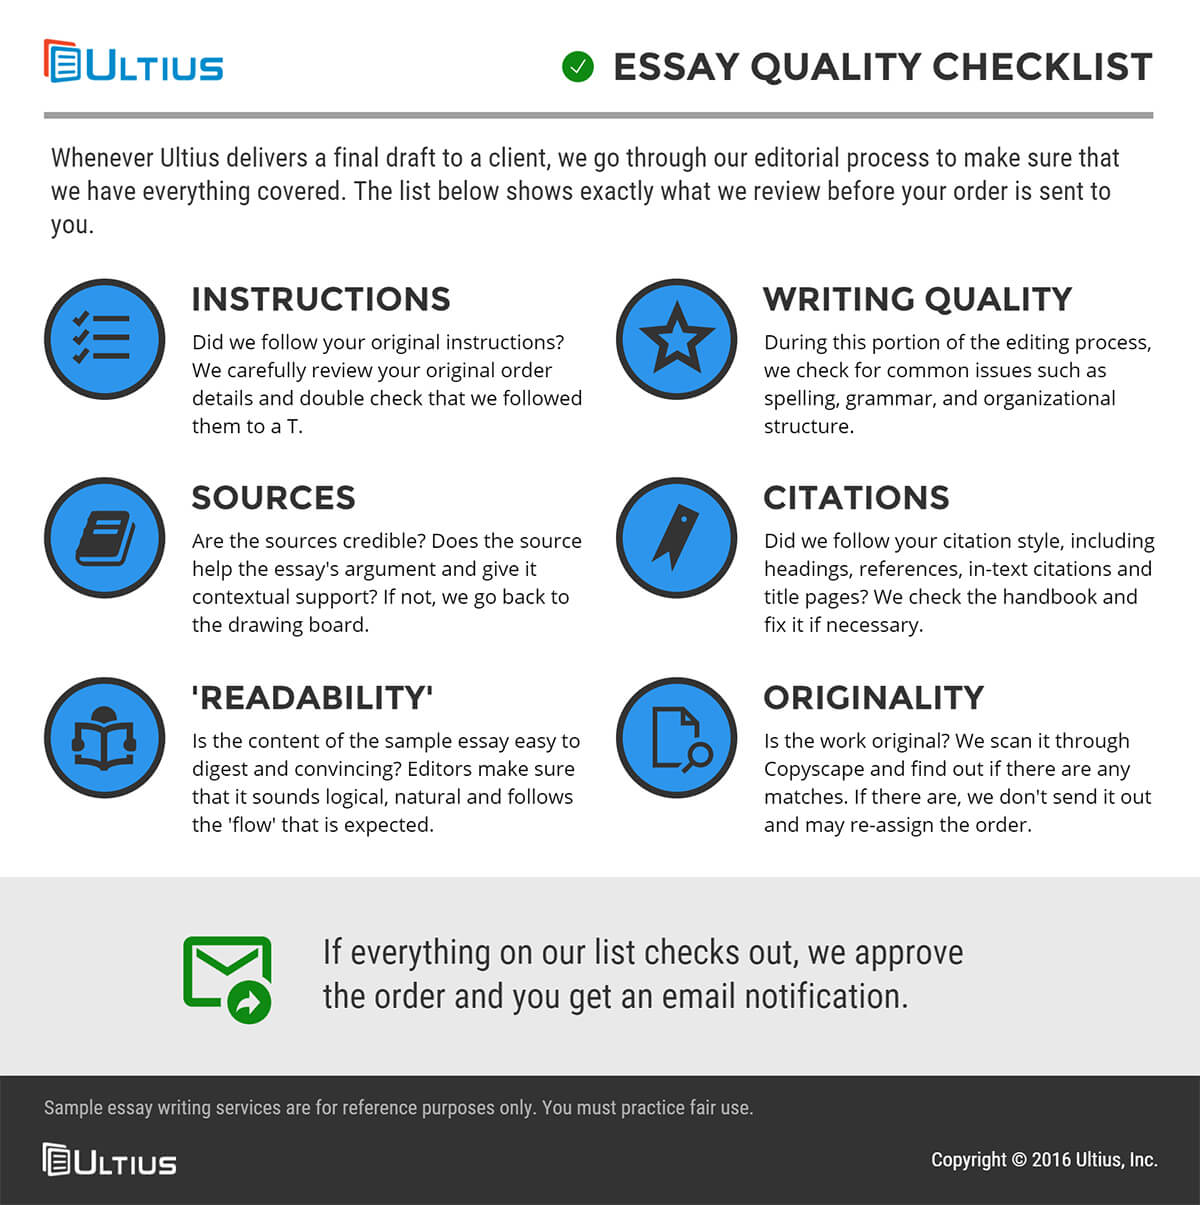 009 Essay Check Example Purchased Quality Unique Checking Services Persuasive Checklist Pdf Checker Grammar Punctuation Free Full